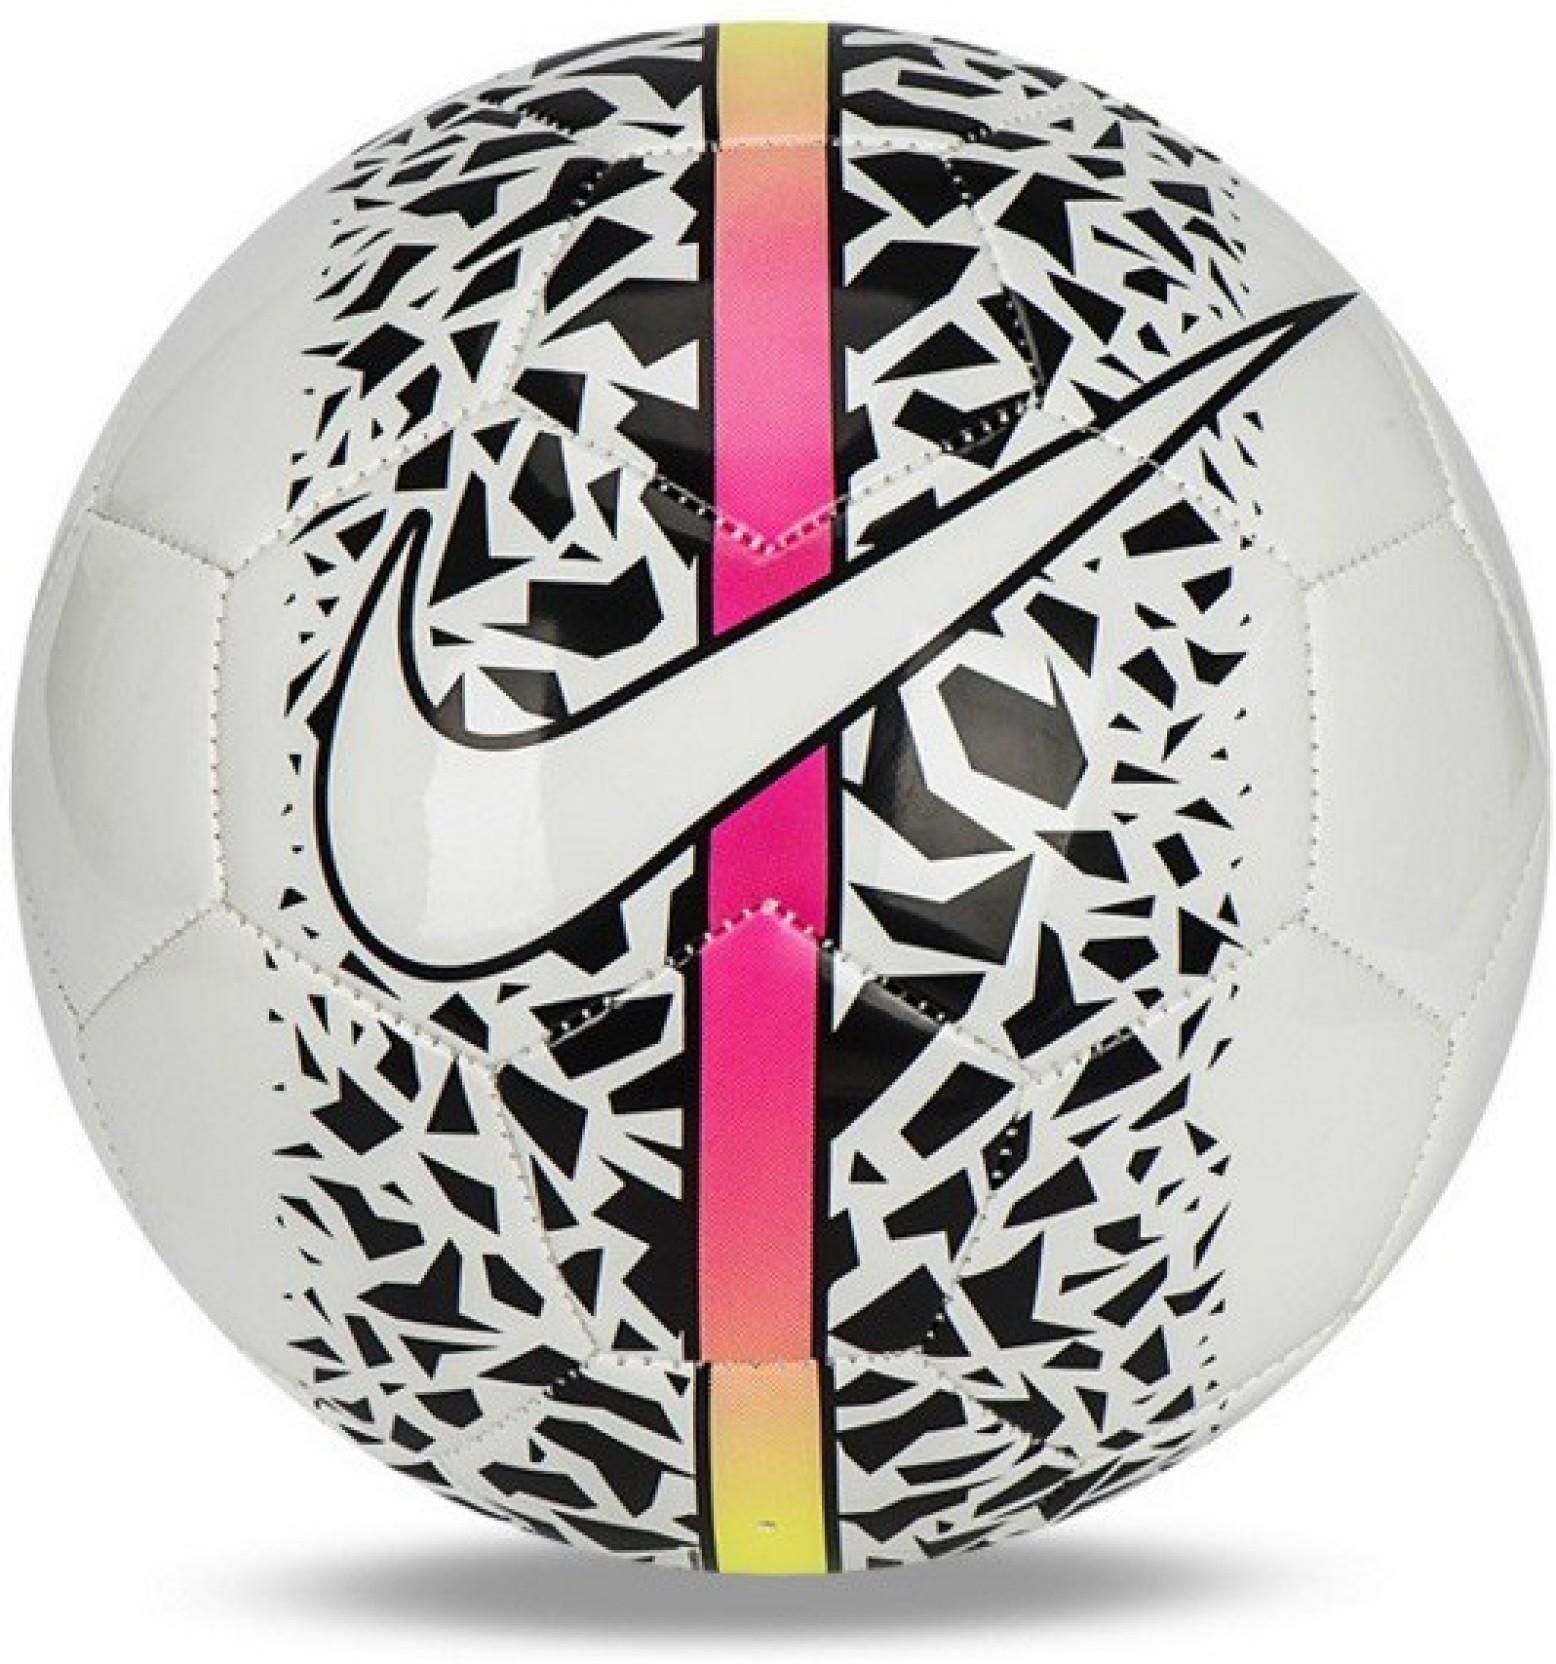 new concept 4a5cc 77f1e Nike hypervenom react Football - Size: 5 - Buy Nike ...